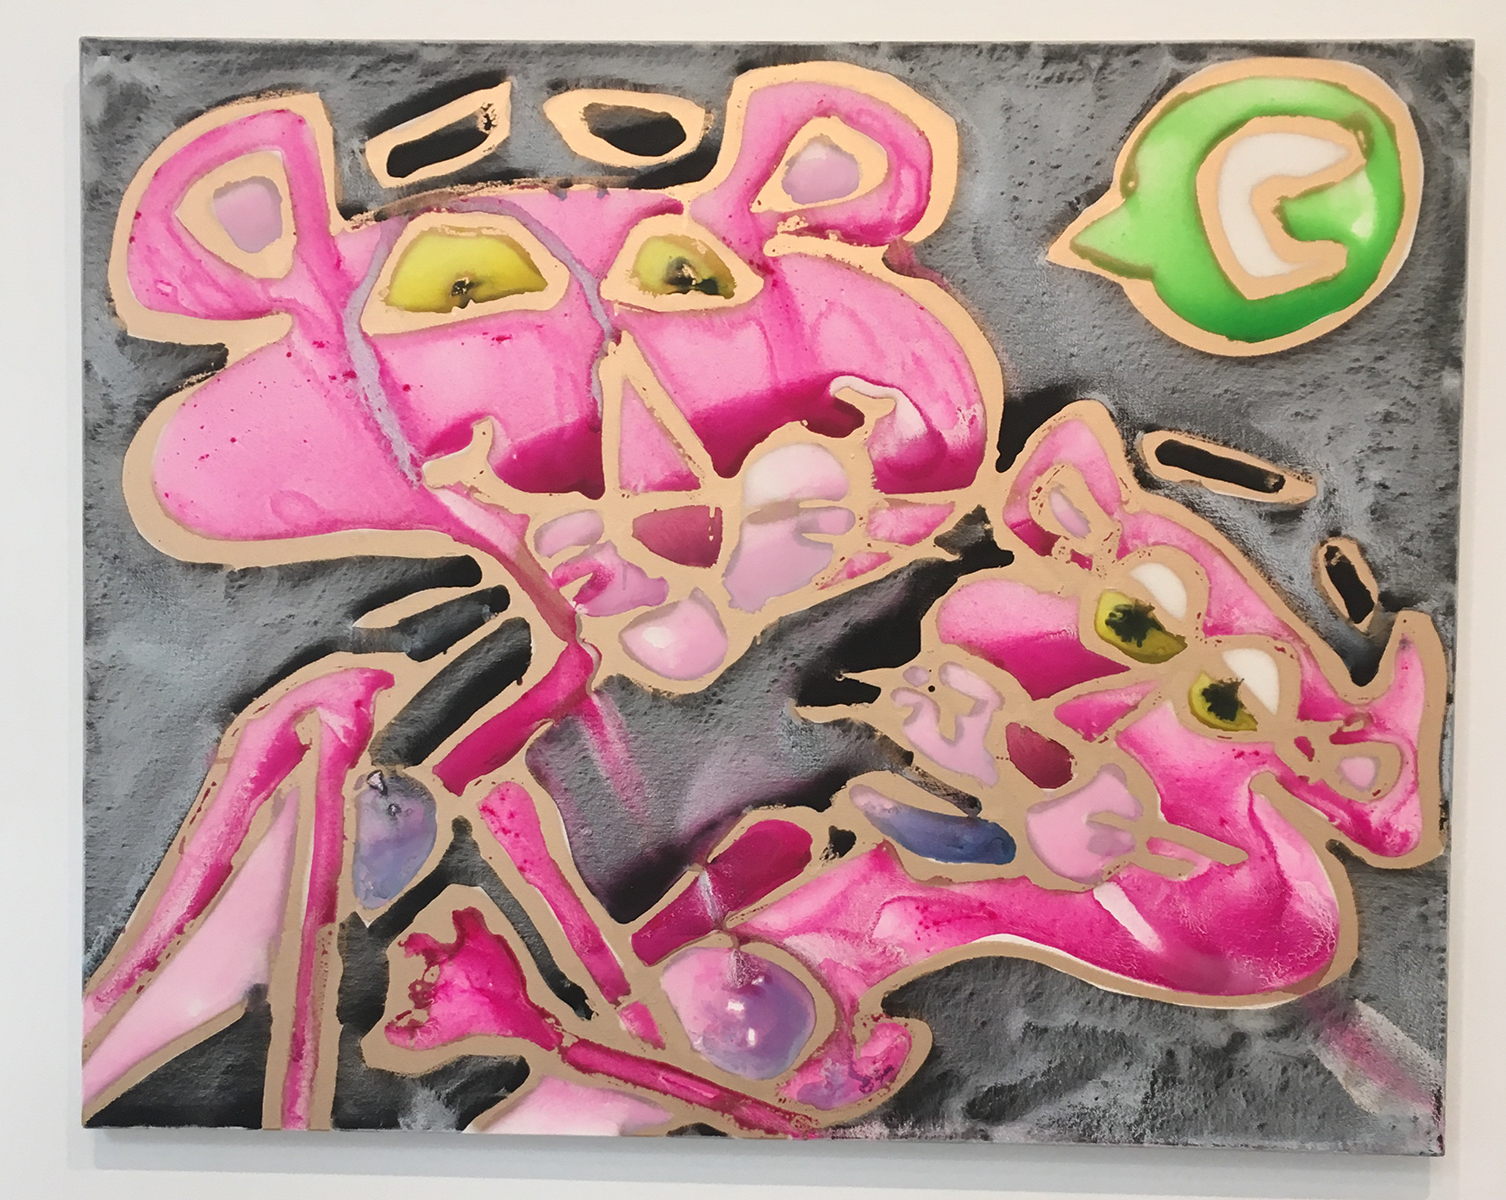 Katherine Bernhardt, Love Online, Acrylic and spray paint on canvas; photo by Sara Farrell Okamura.